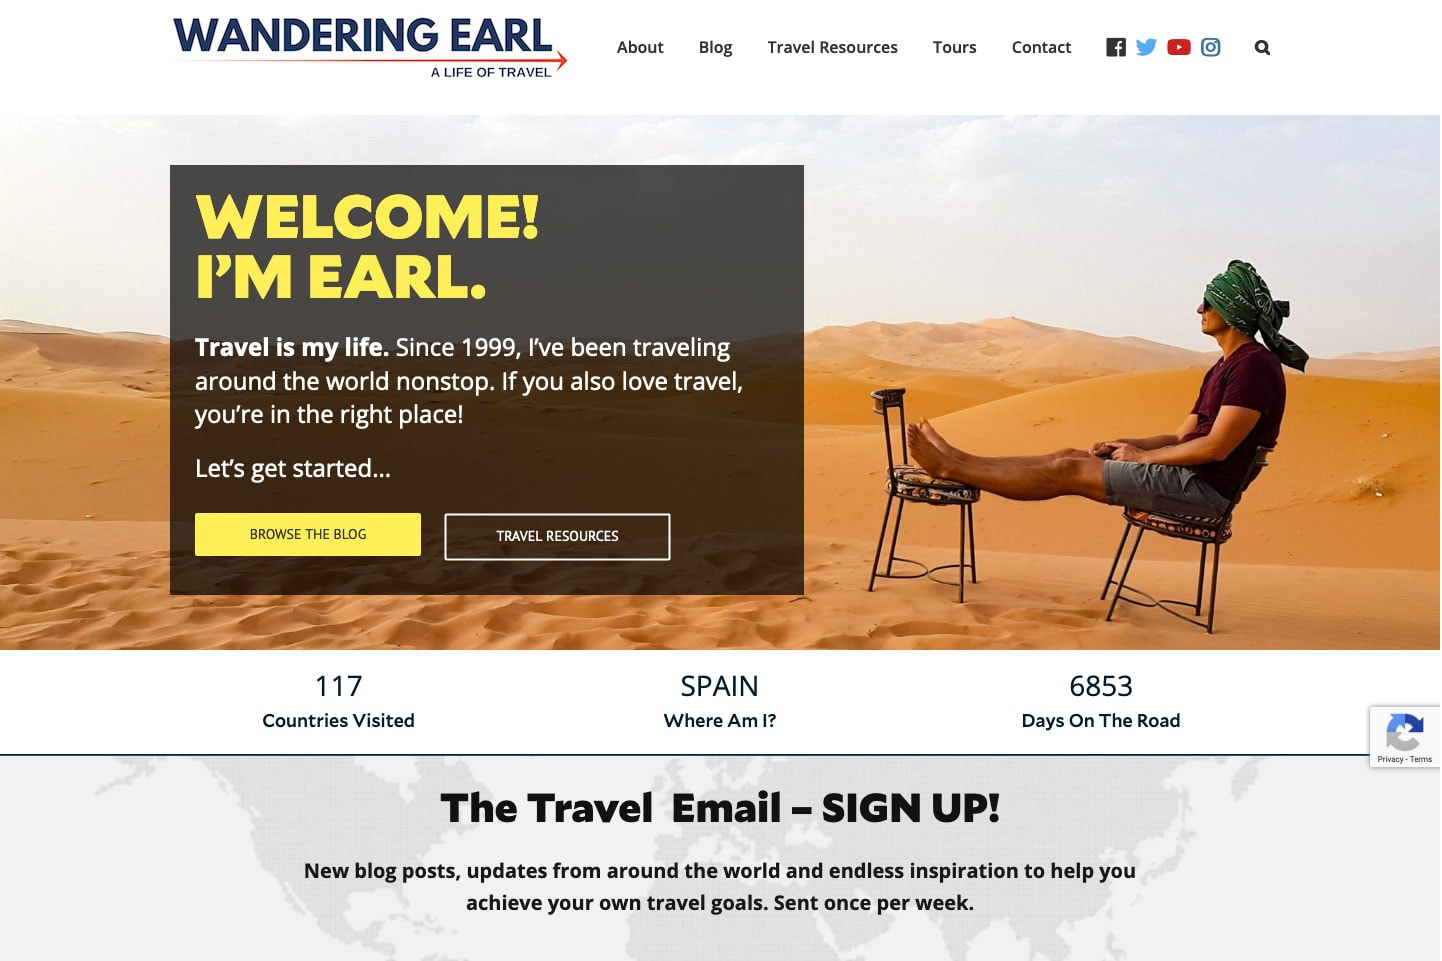 Wandering Earl Blog